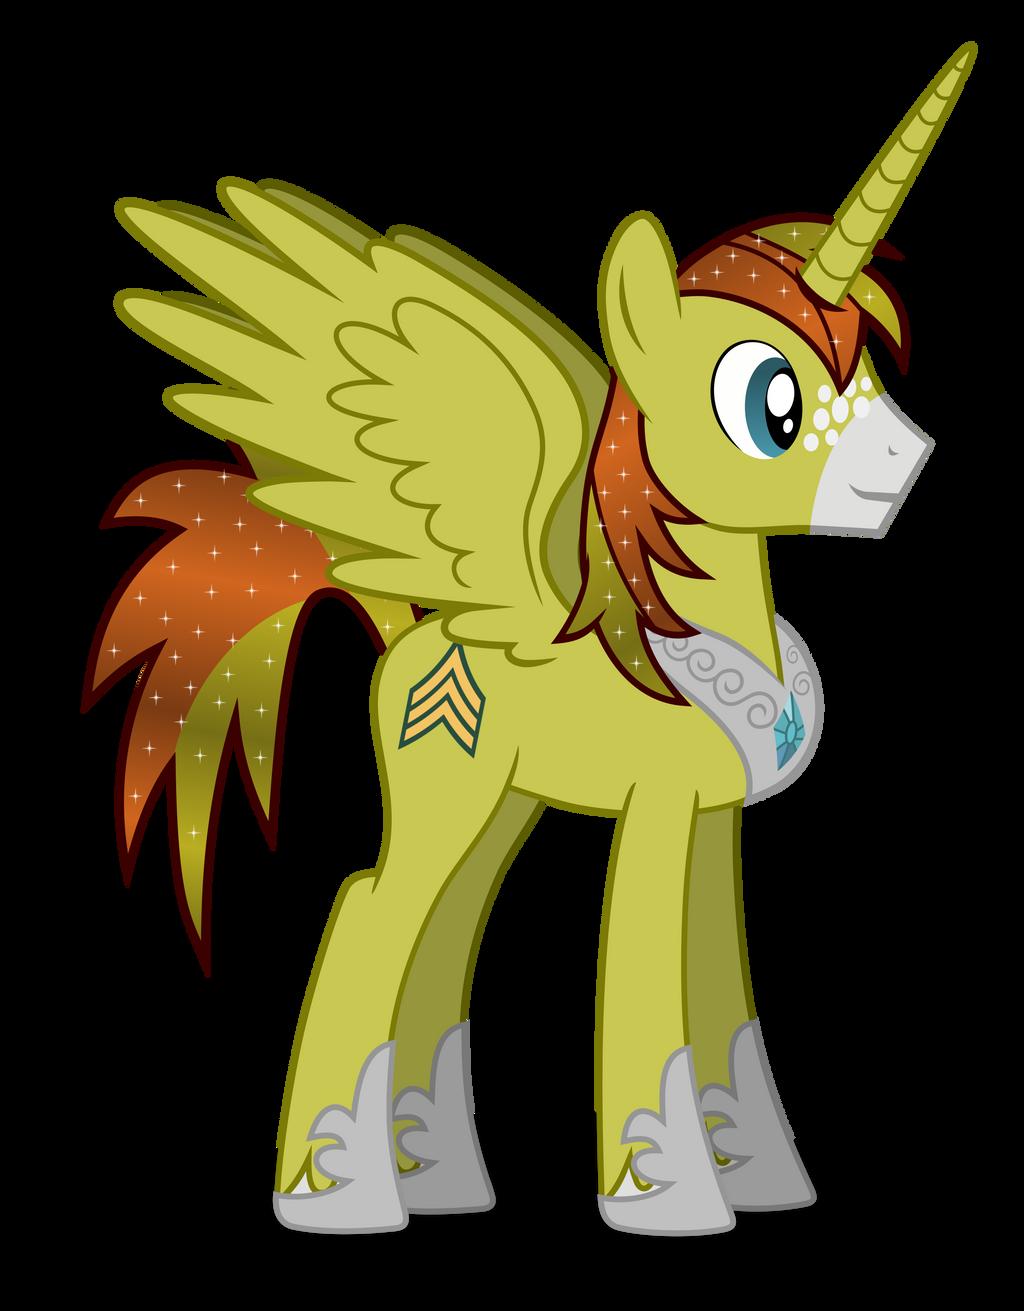 Allen Sparkle - Alicorn by DolphinFox